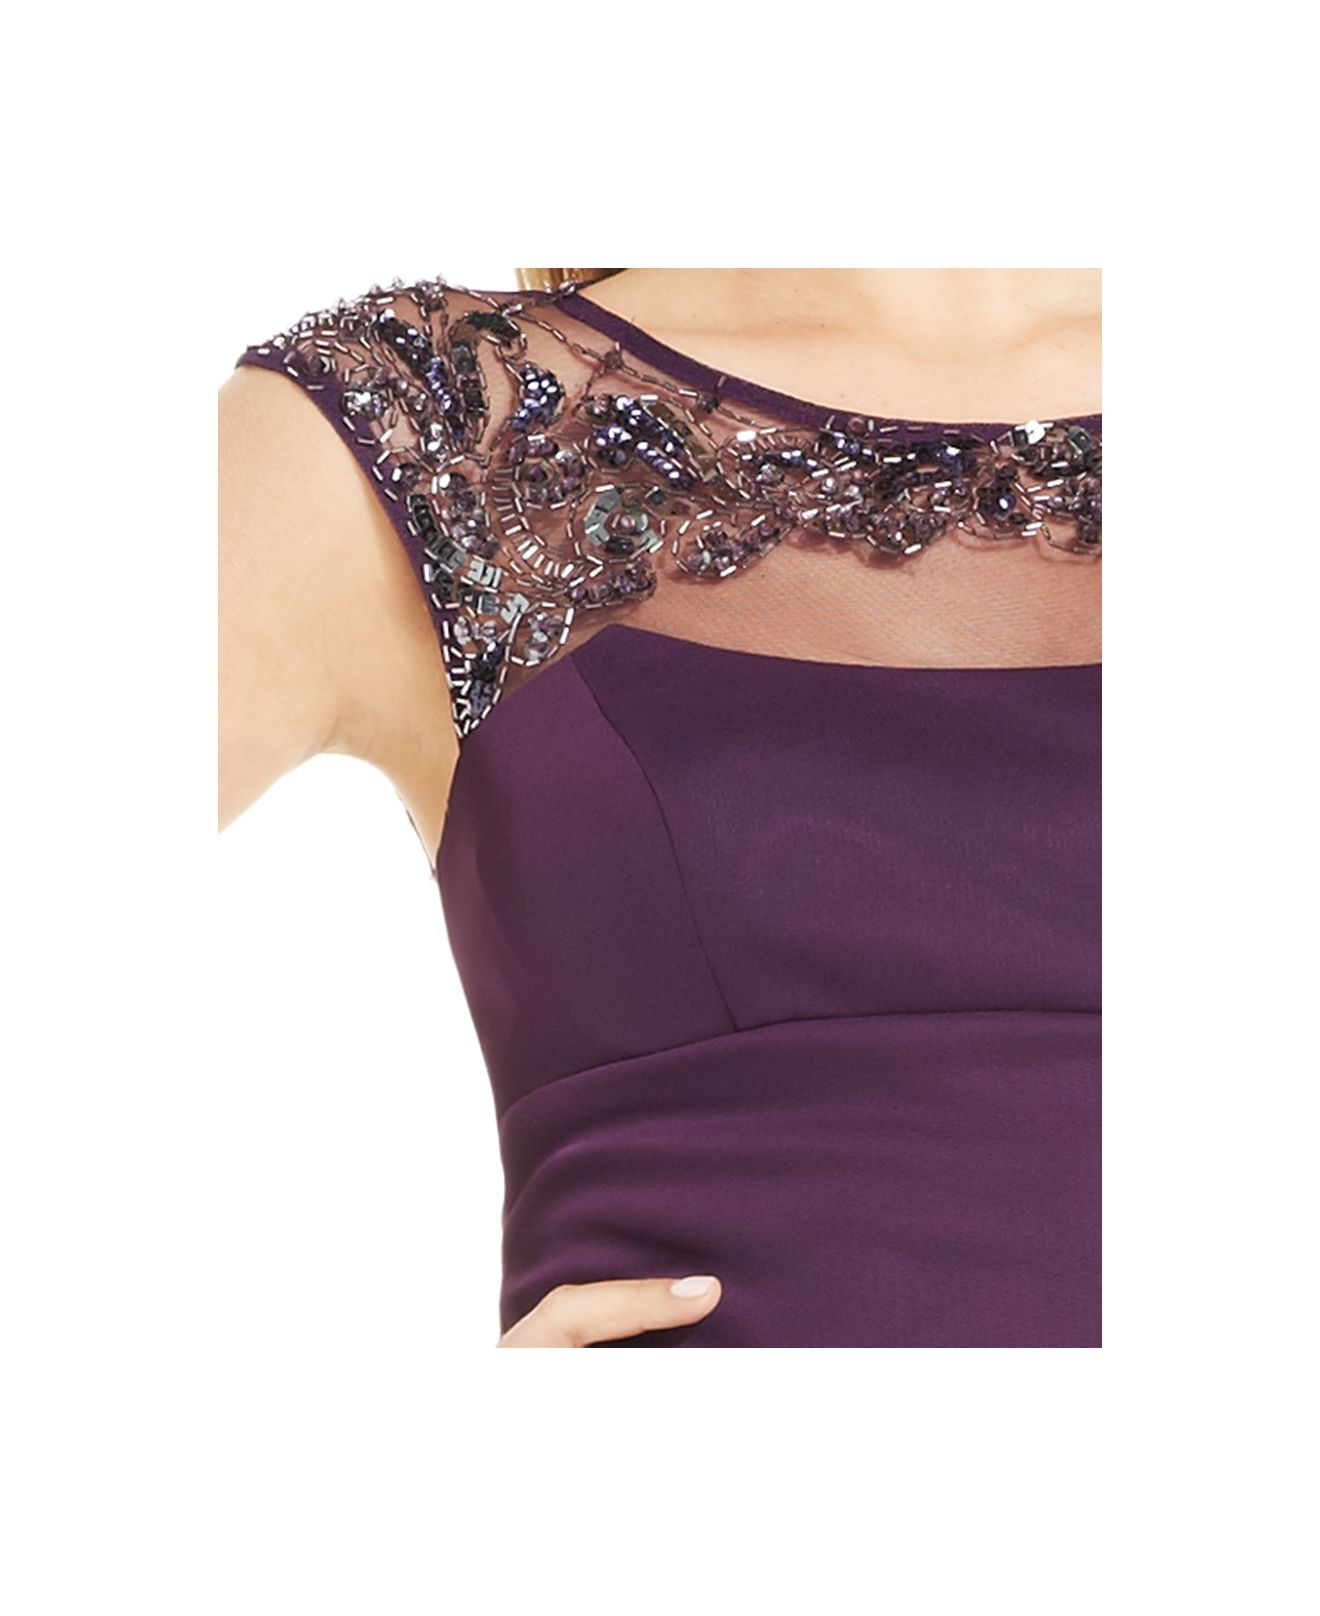 xscape cap sleeve illusion beaded dress plum | ivo hoogveld